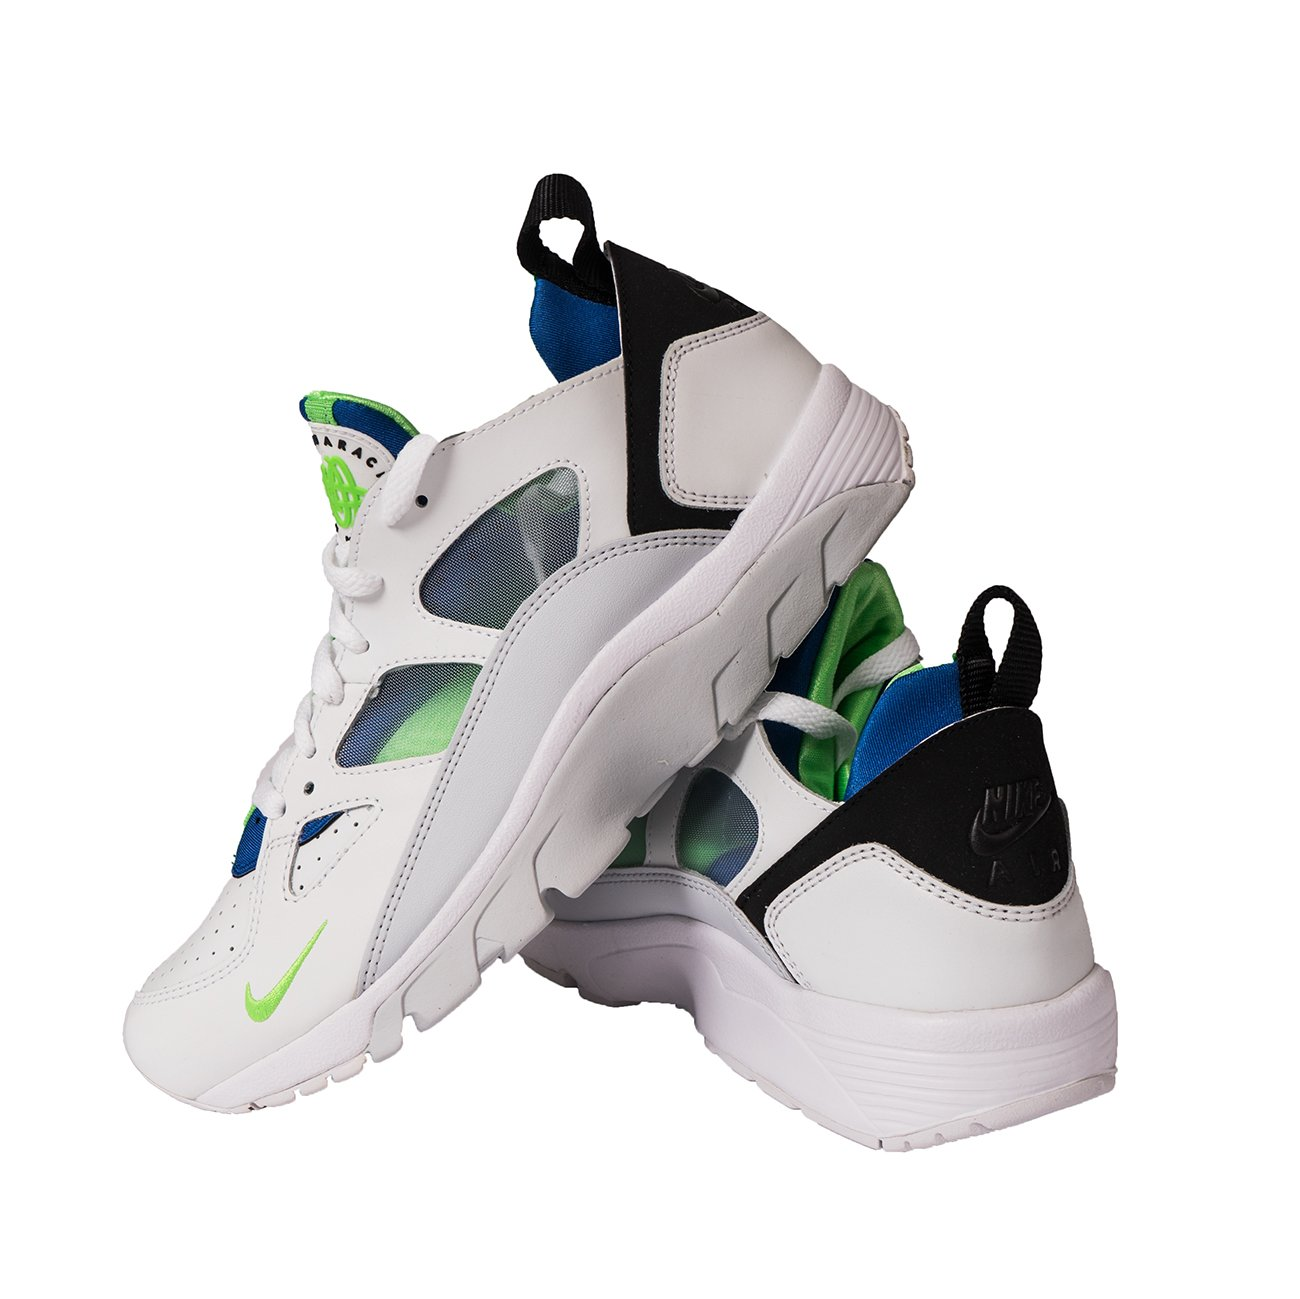 online retailer 85fe5 c2e17 australia customer reviews 9845b c7d11  coupon code for nike air green  trainer huarache air low mens mens white royal blue scream